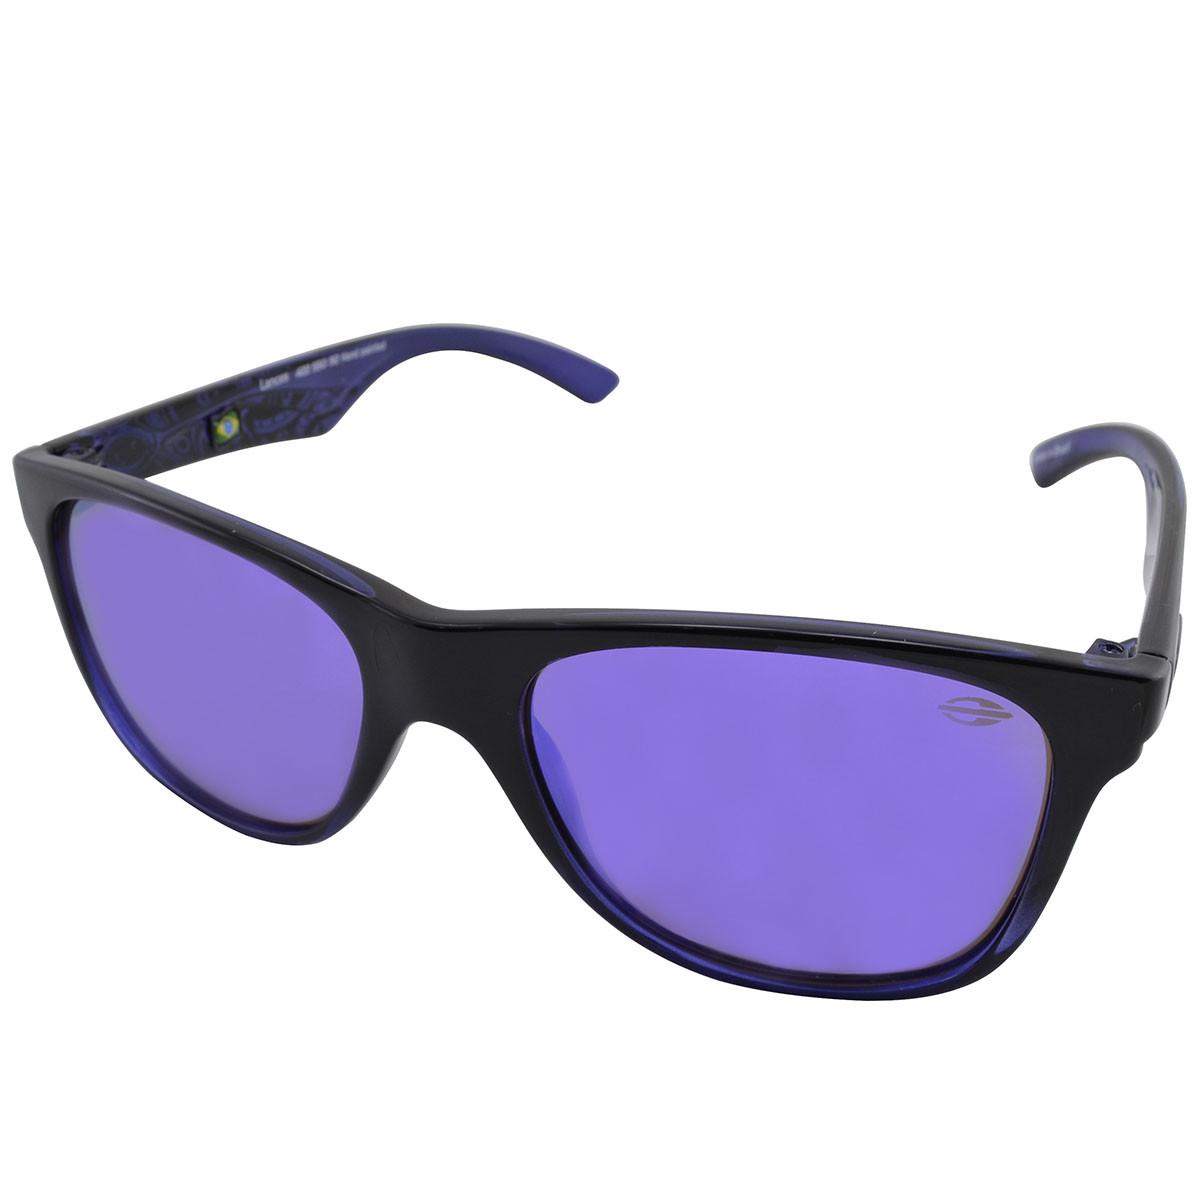 Óculos Mormaii Lances Preto Brilho Lente Violeta ref 42255092 eab1cae931